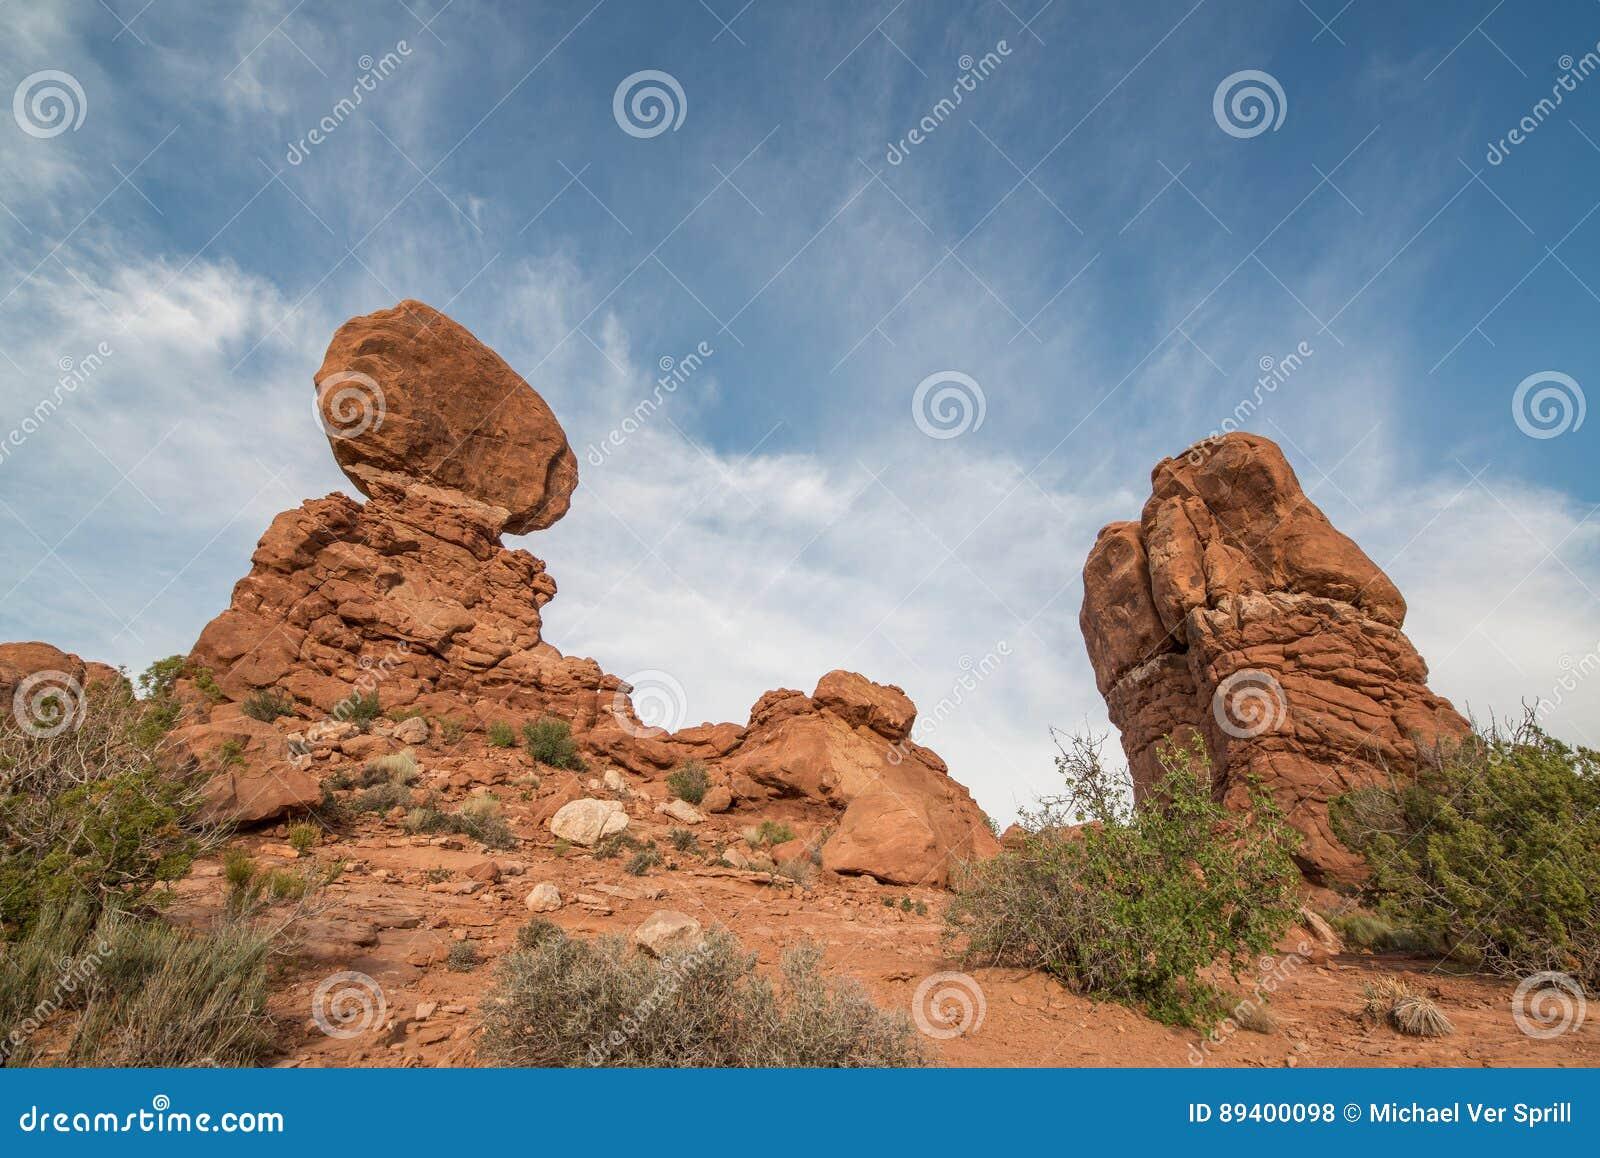 Rocha equilibrada no parque nacional dos arcos